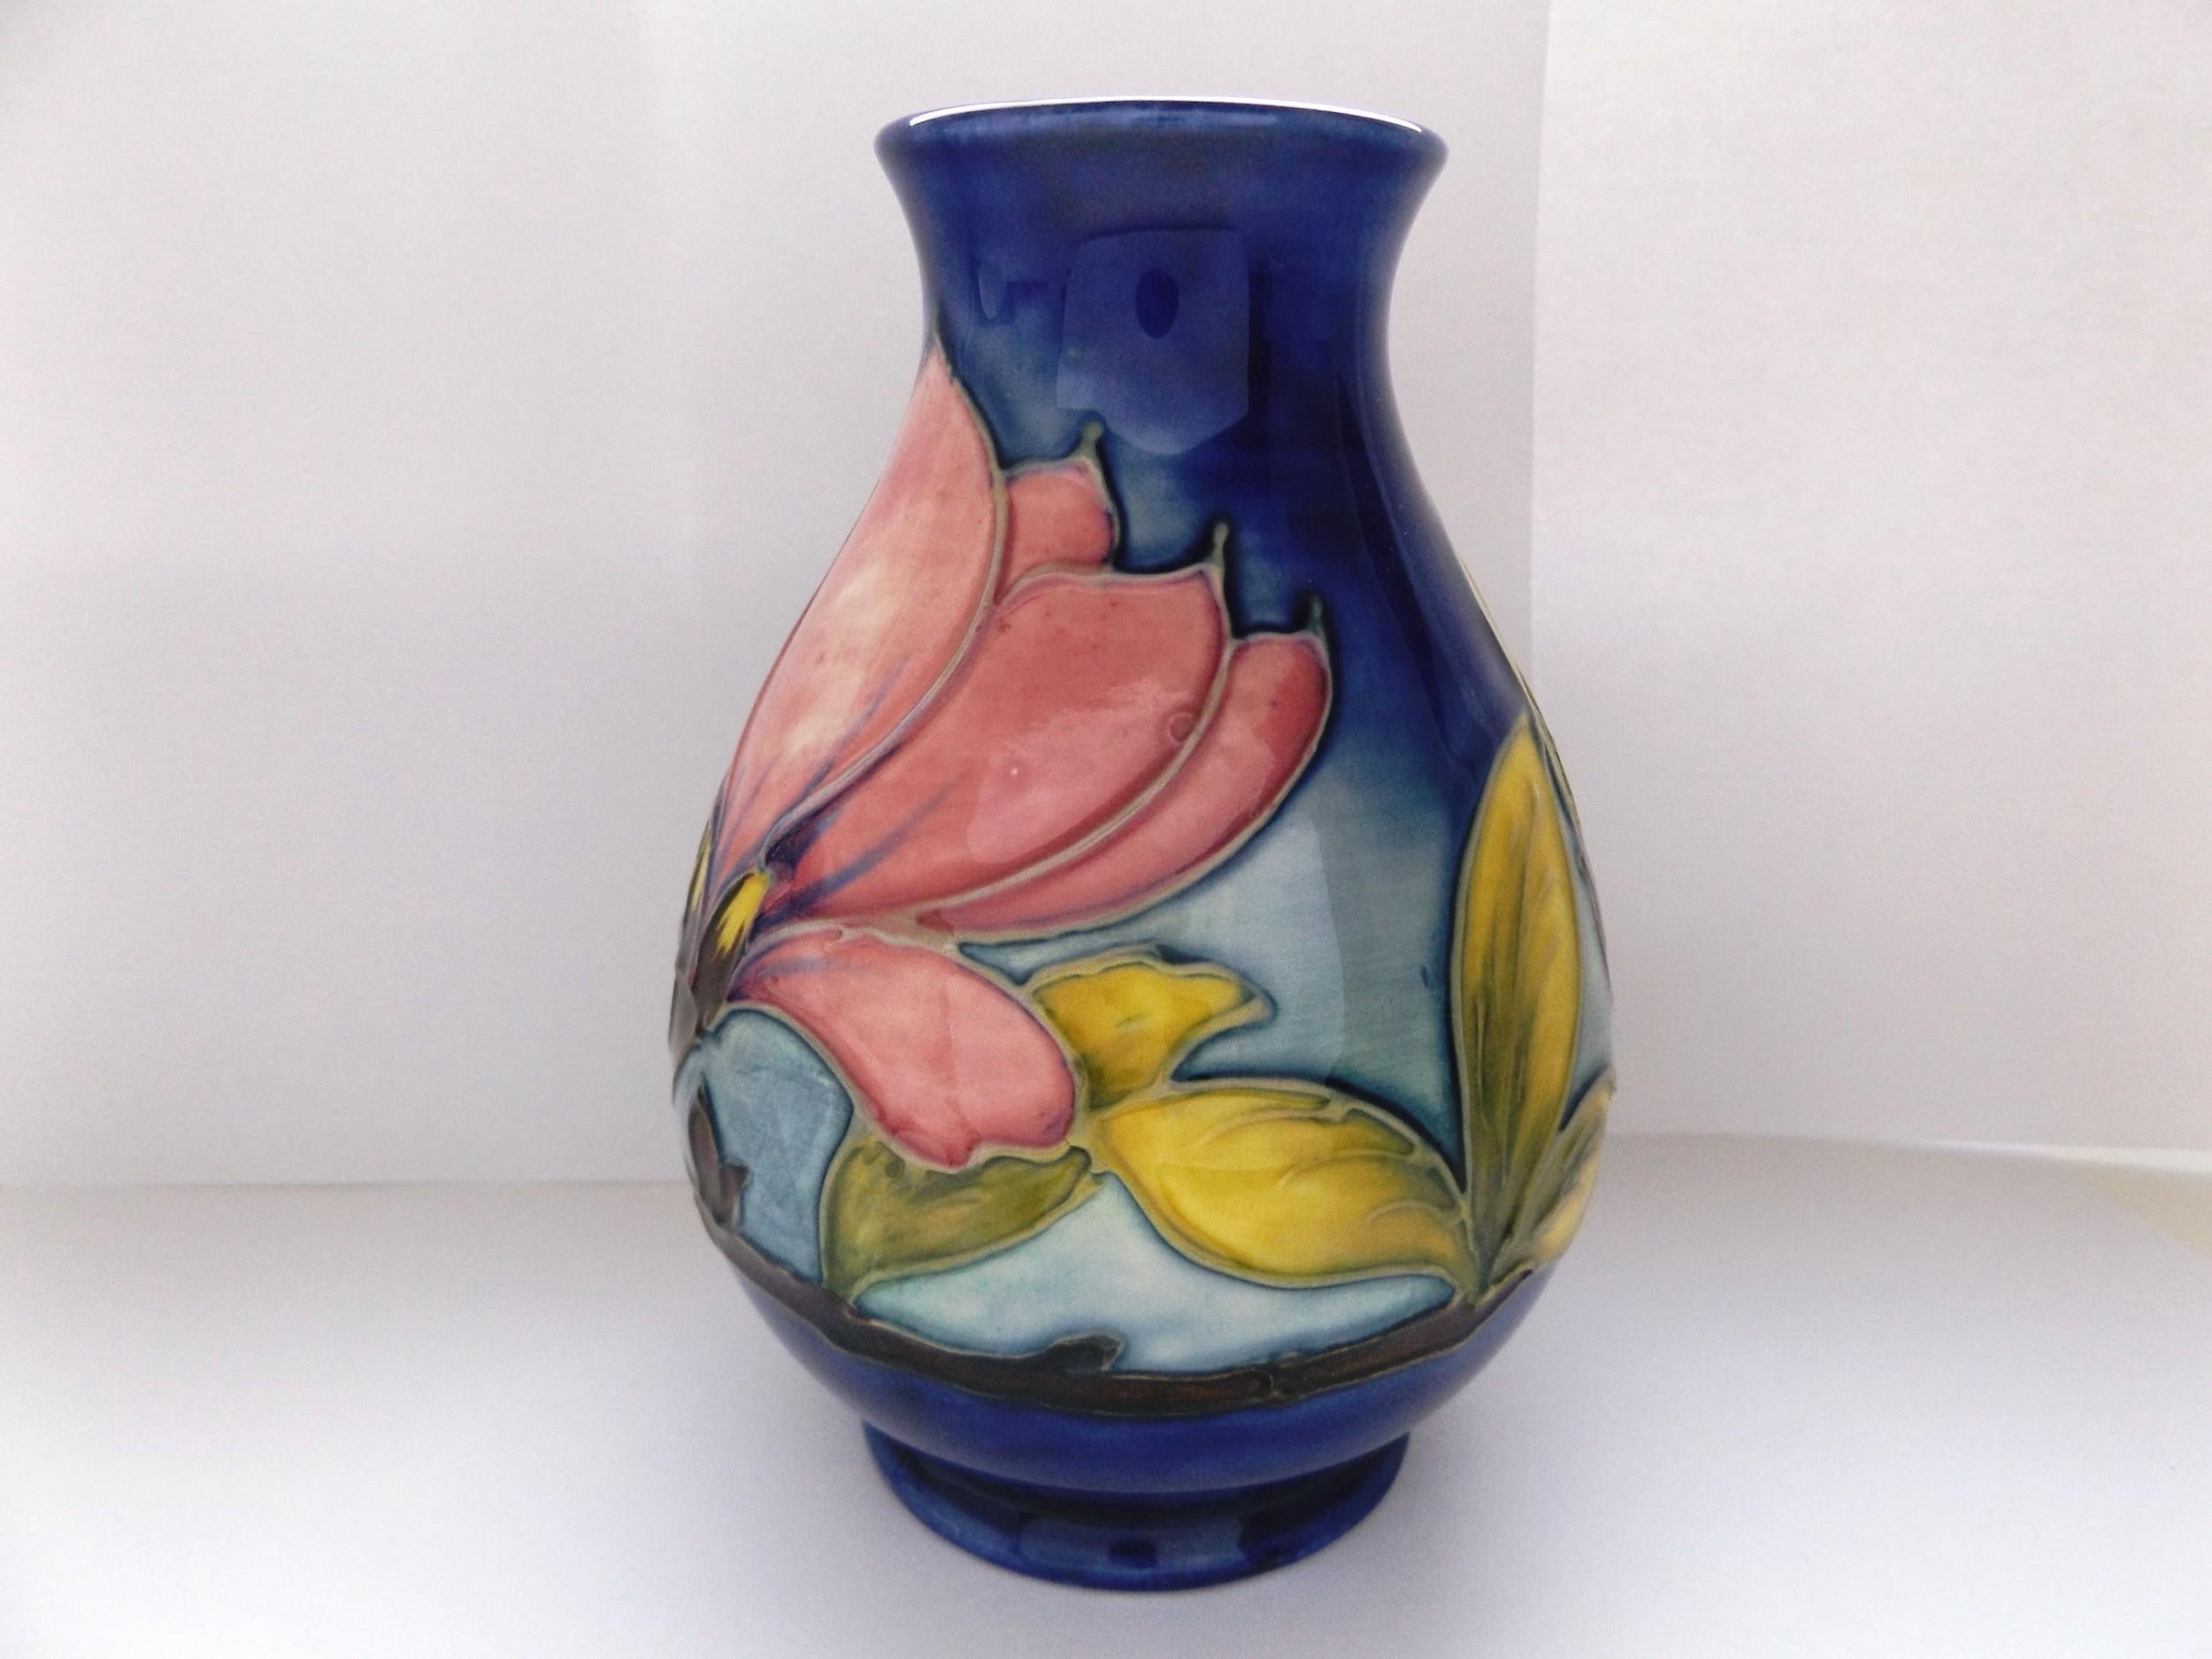 Lovely moorcroft magnolia pattern medium vase 502385 page load time 030 seconds reviewsmspy